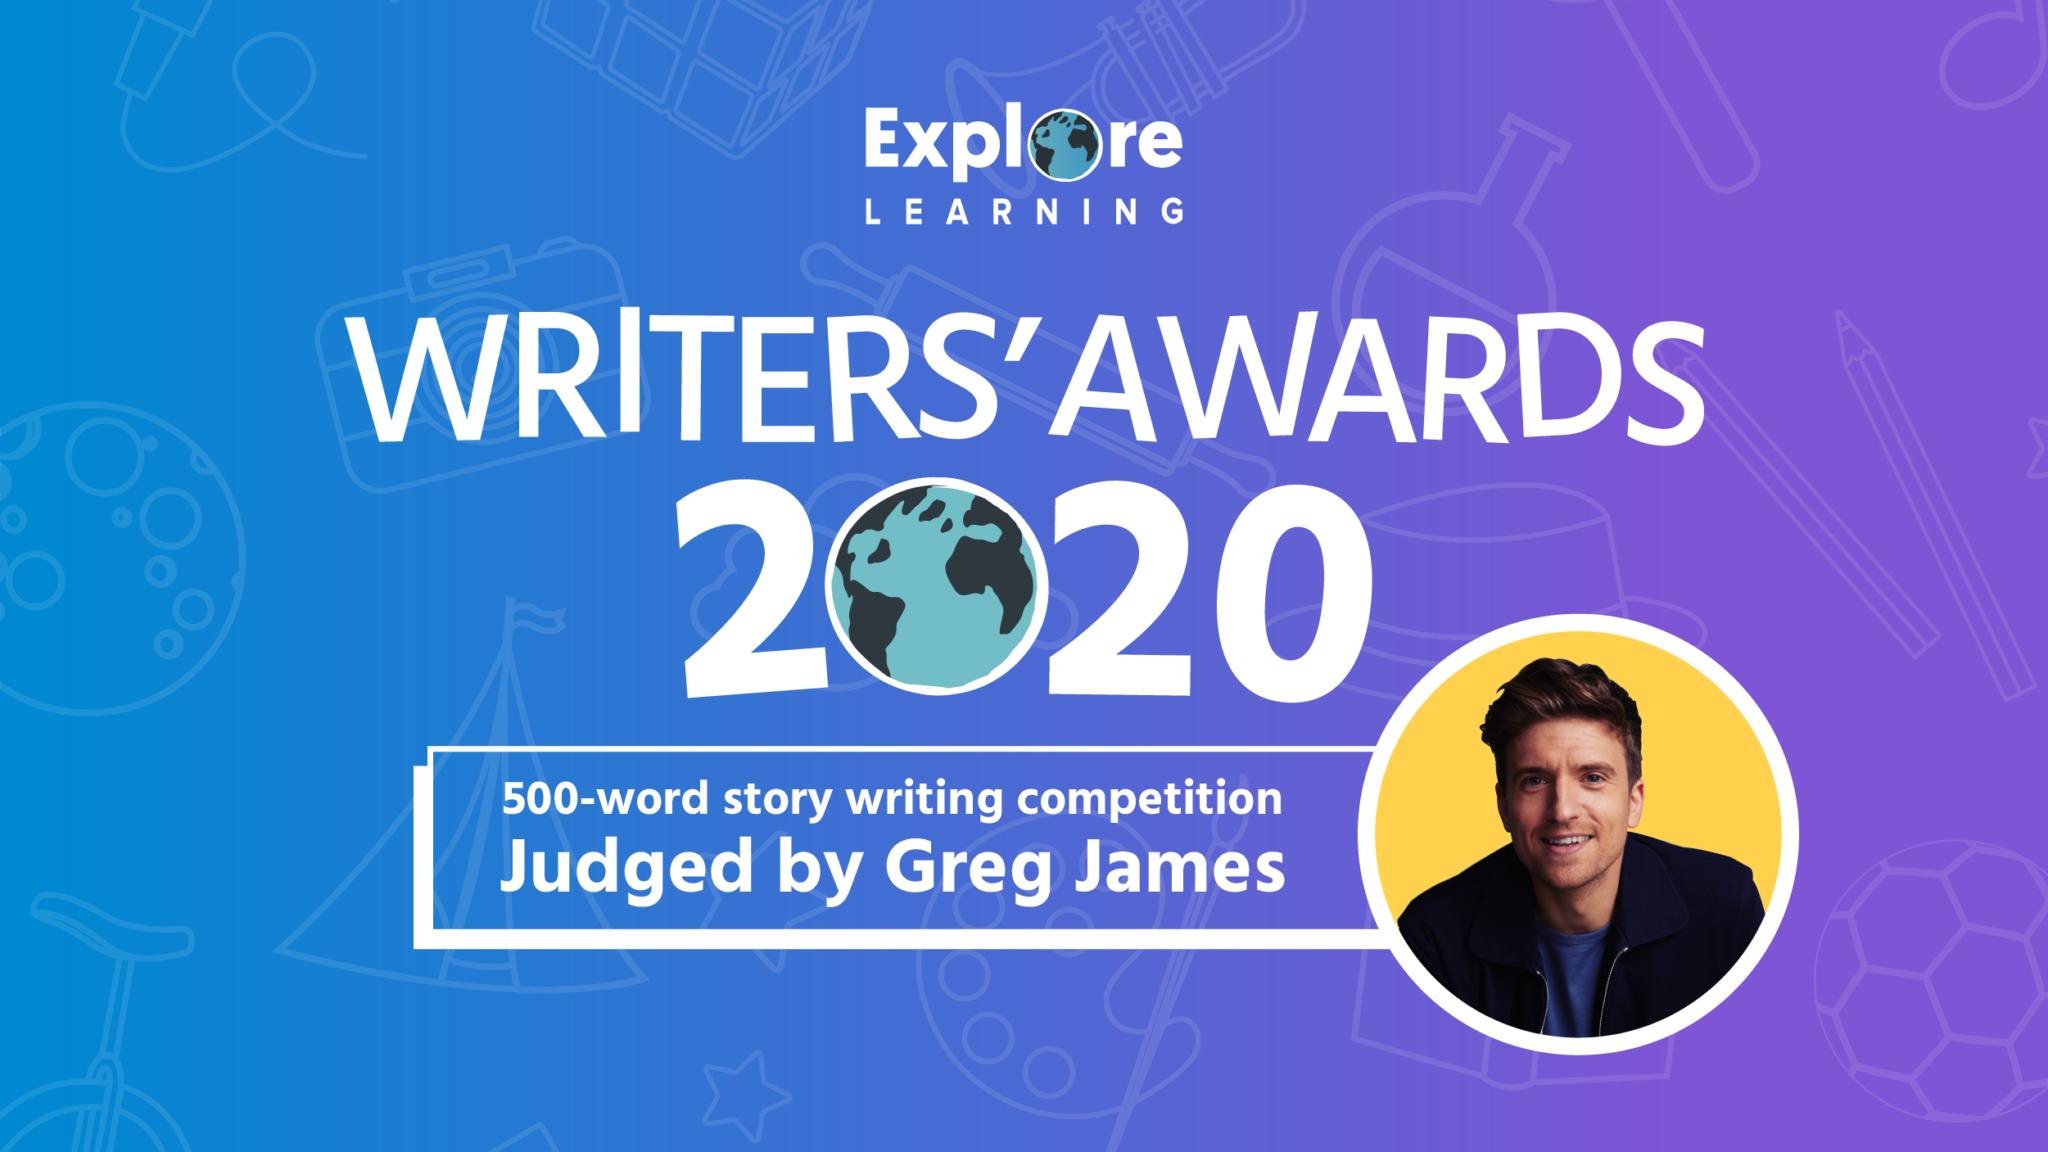 Explore Learning Writers' Awards 2020